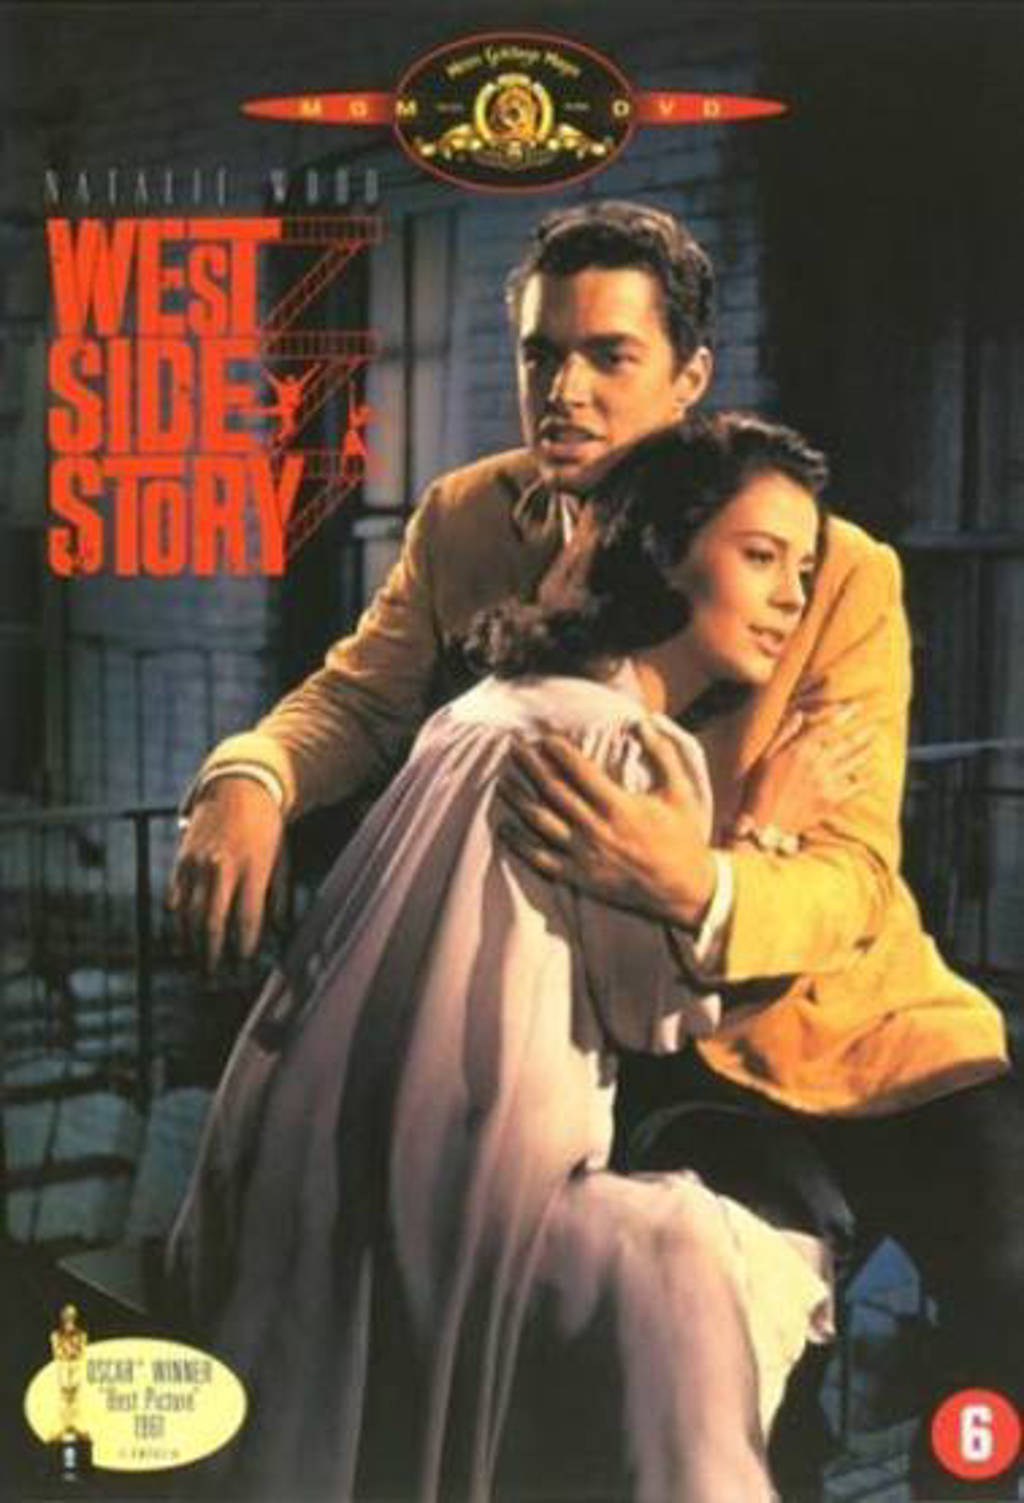 West side story (DVD)